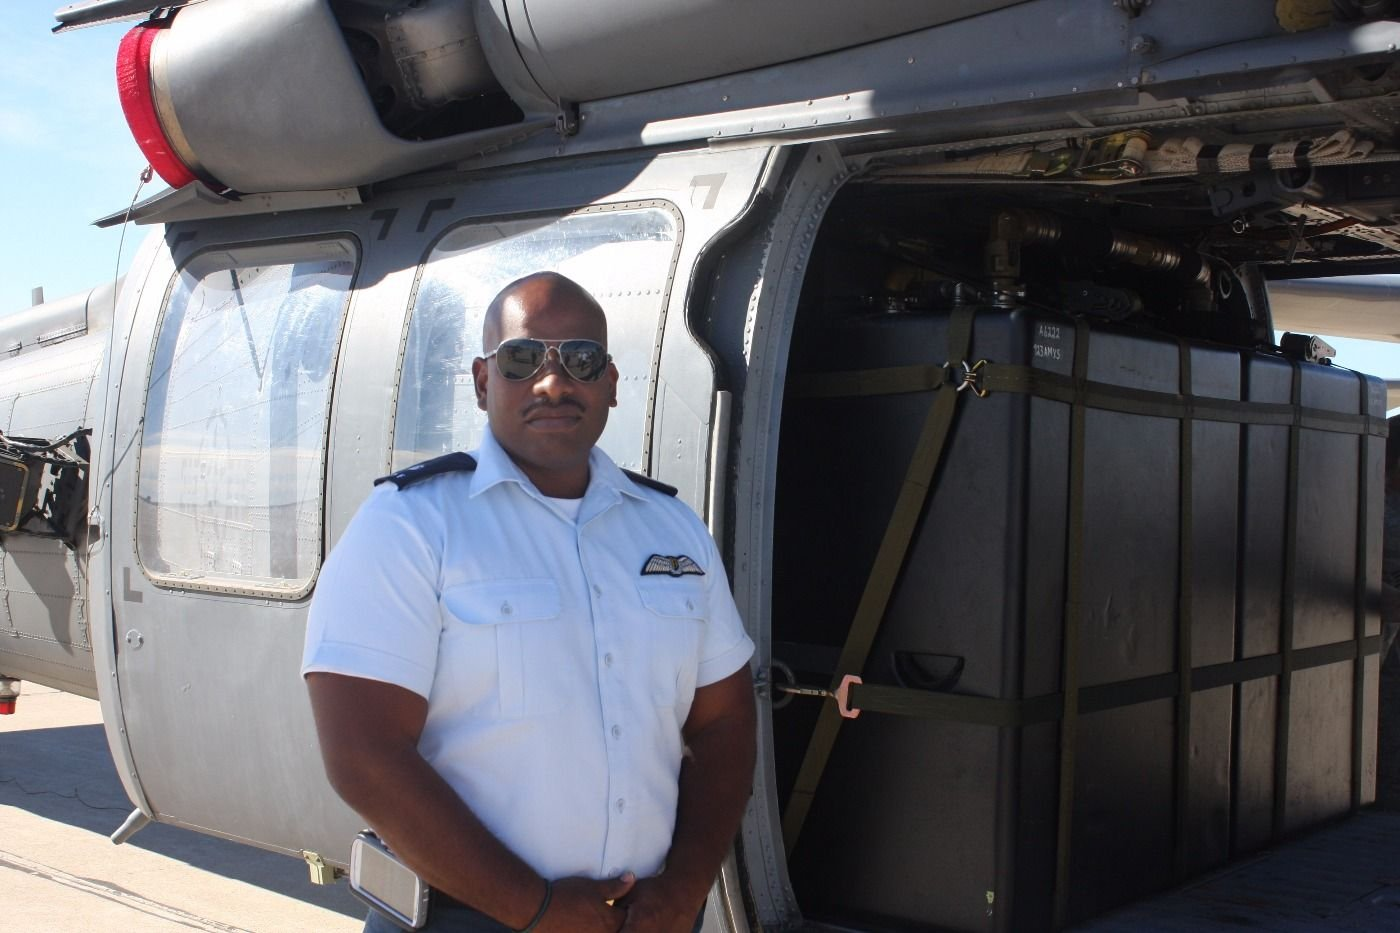 Belize analisa novas maneiras de combater crime organizado transnacional